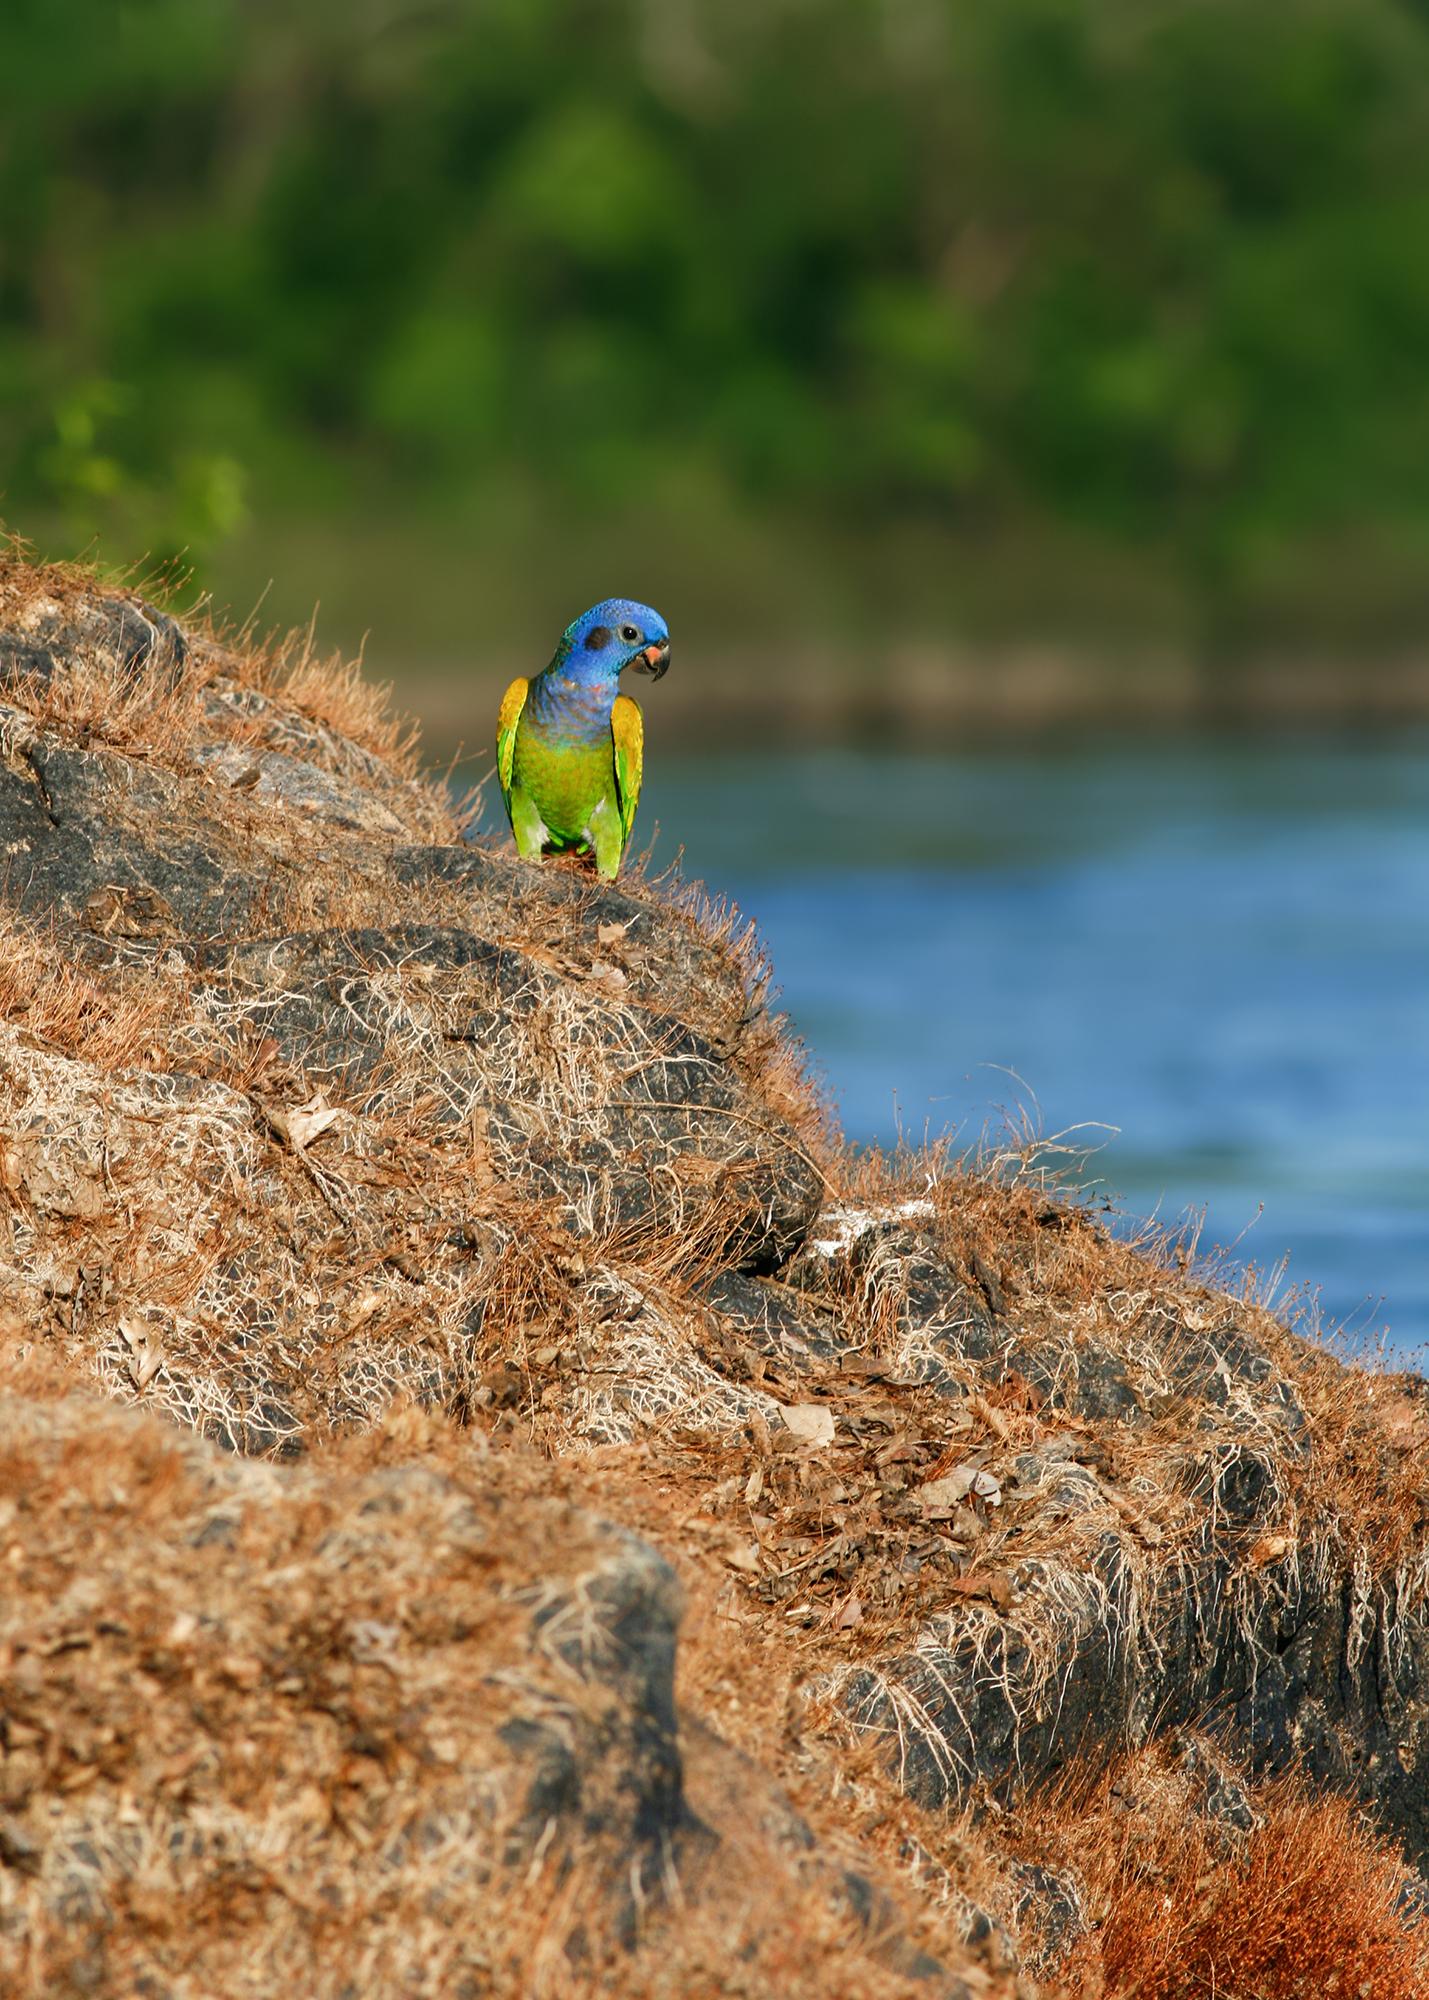 Blue-headed Parrot JPEG_web 2.jpg